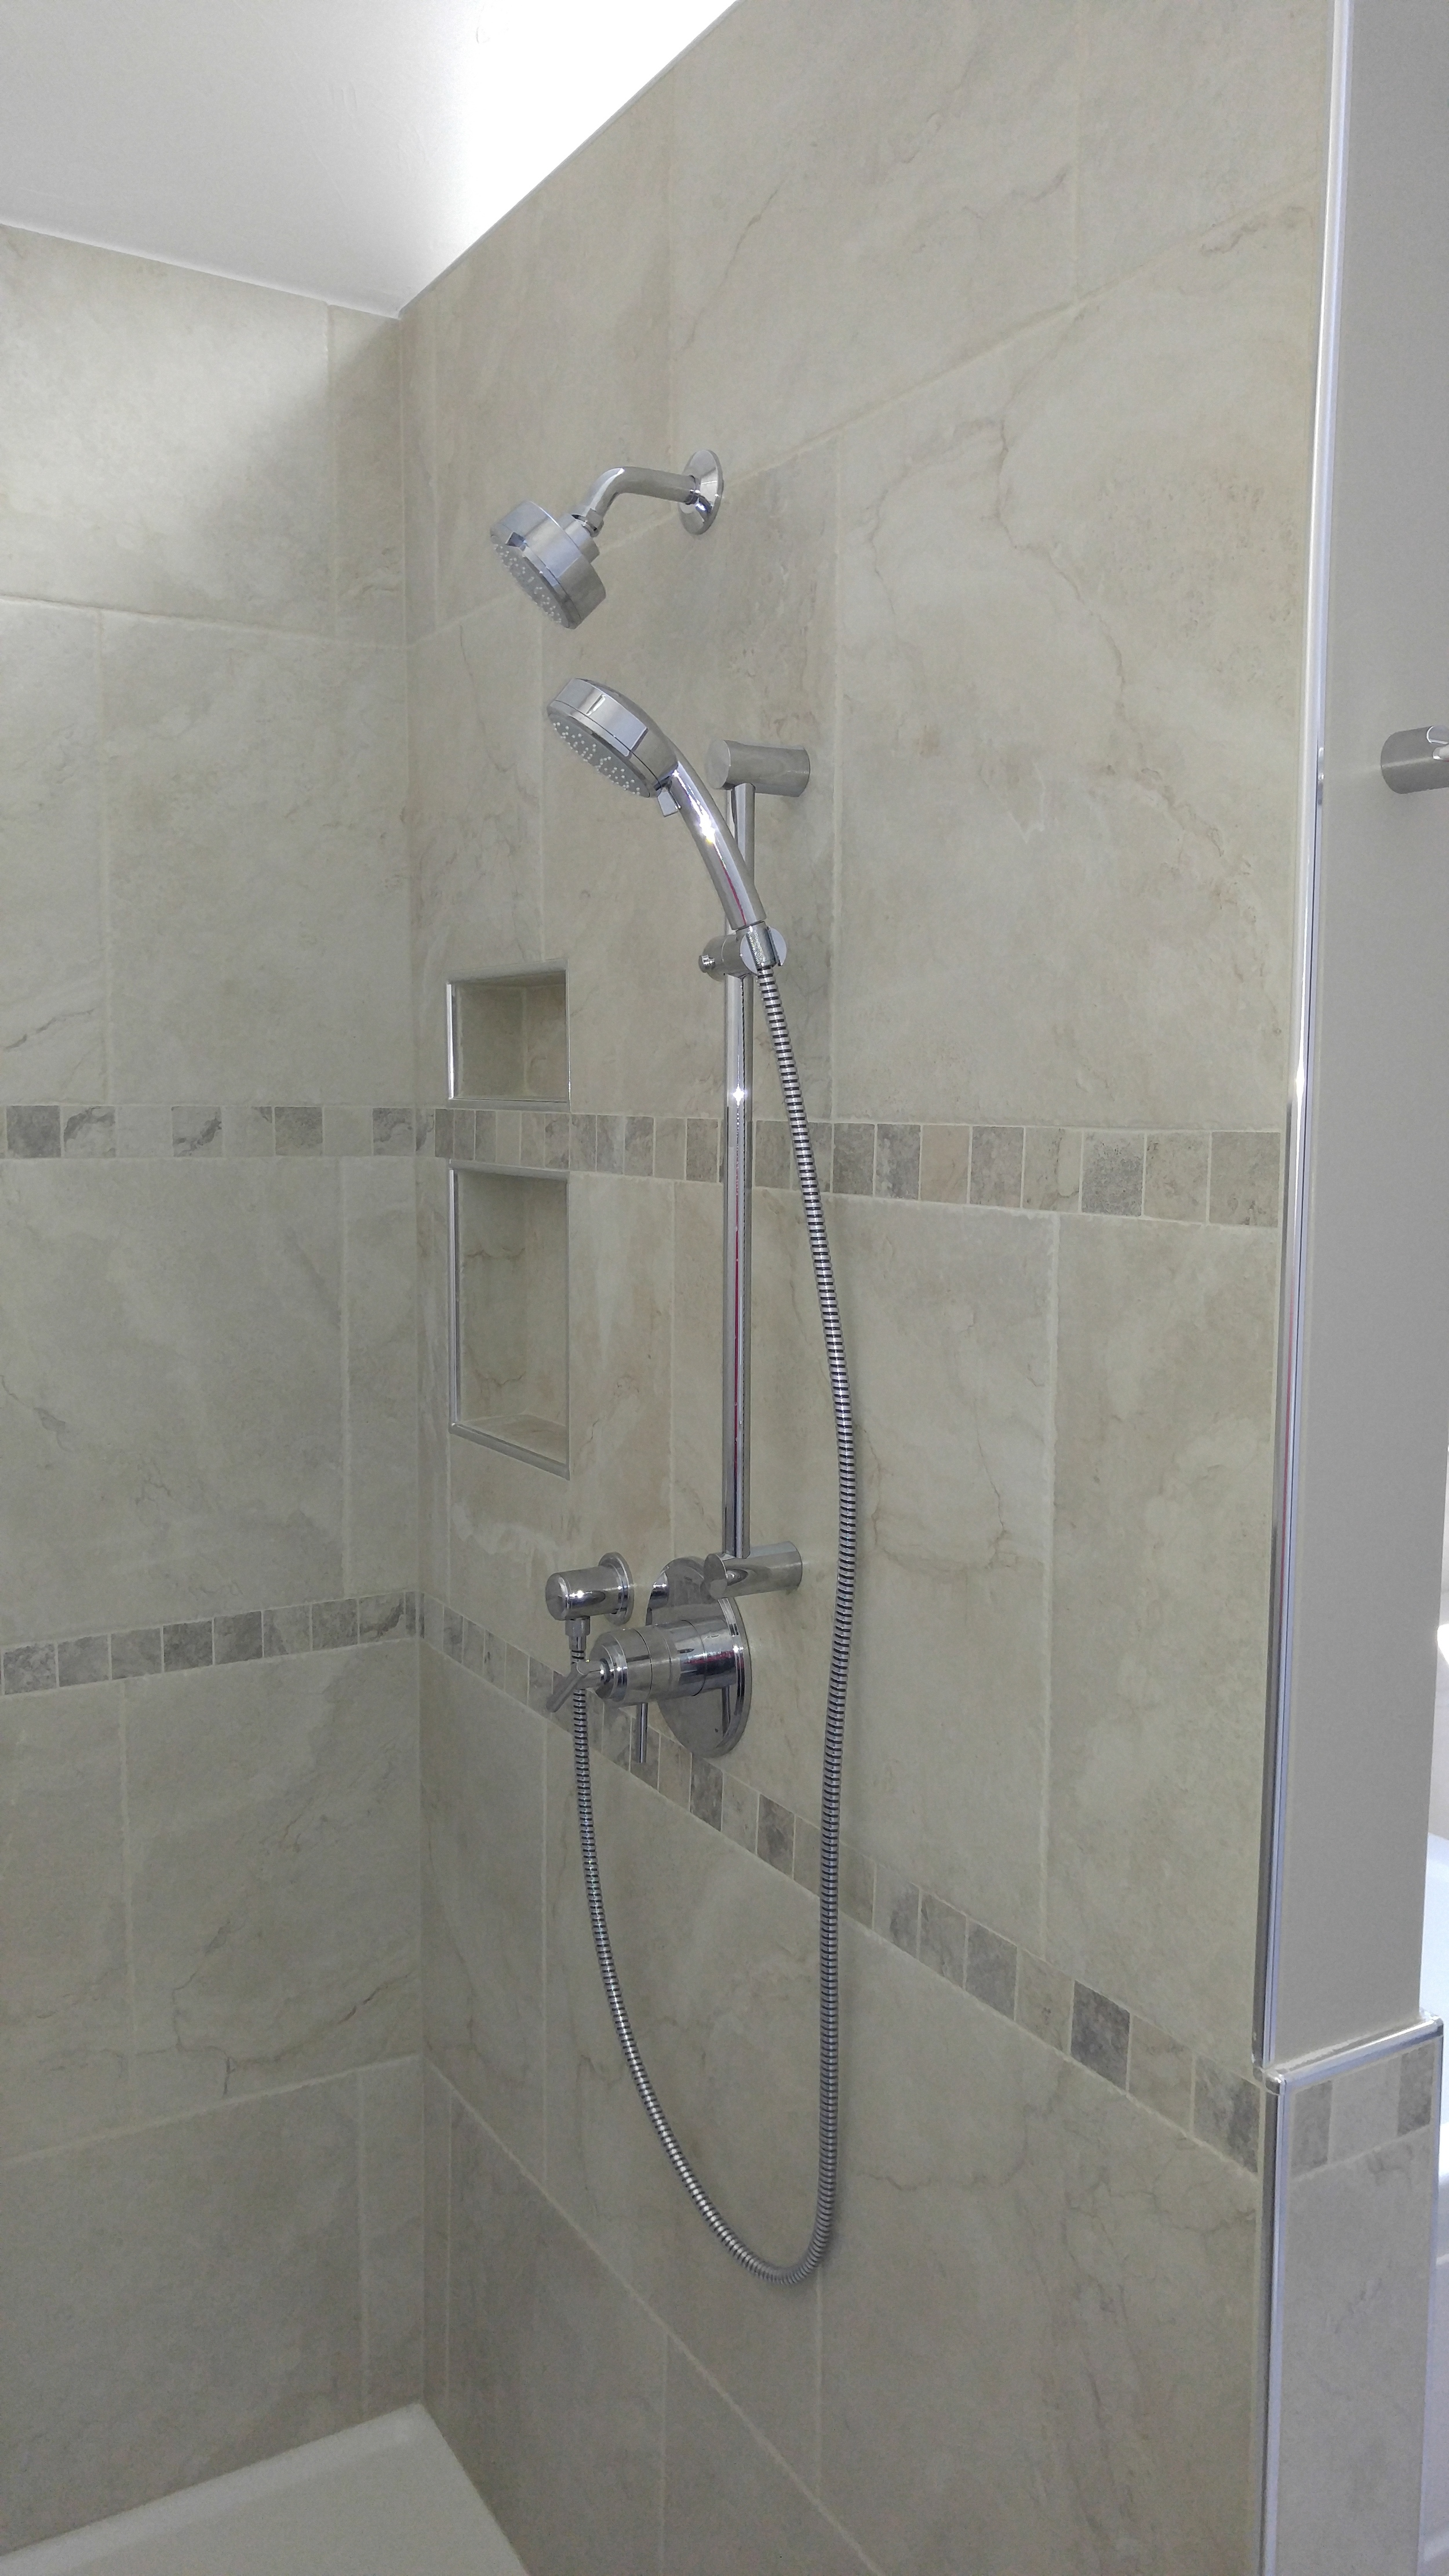 Upscale Bathroom Renovation/Remodel - Shrewsbury